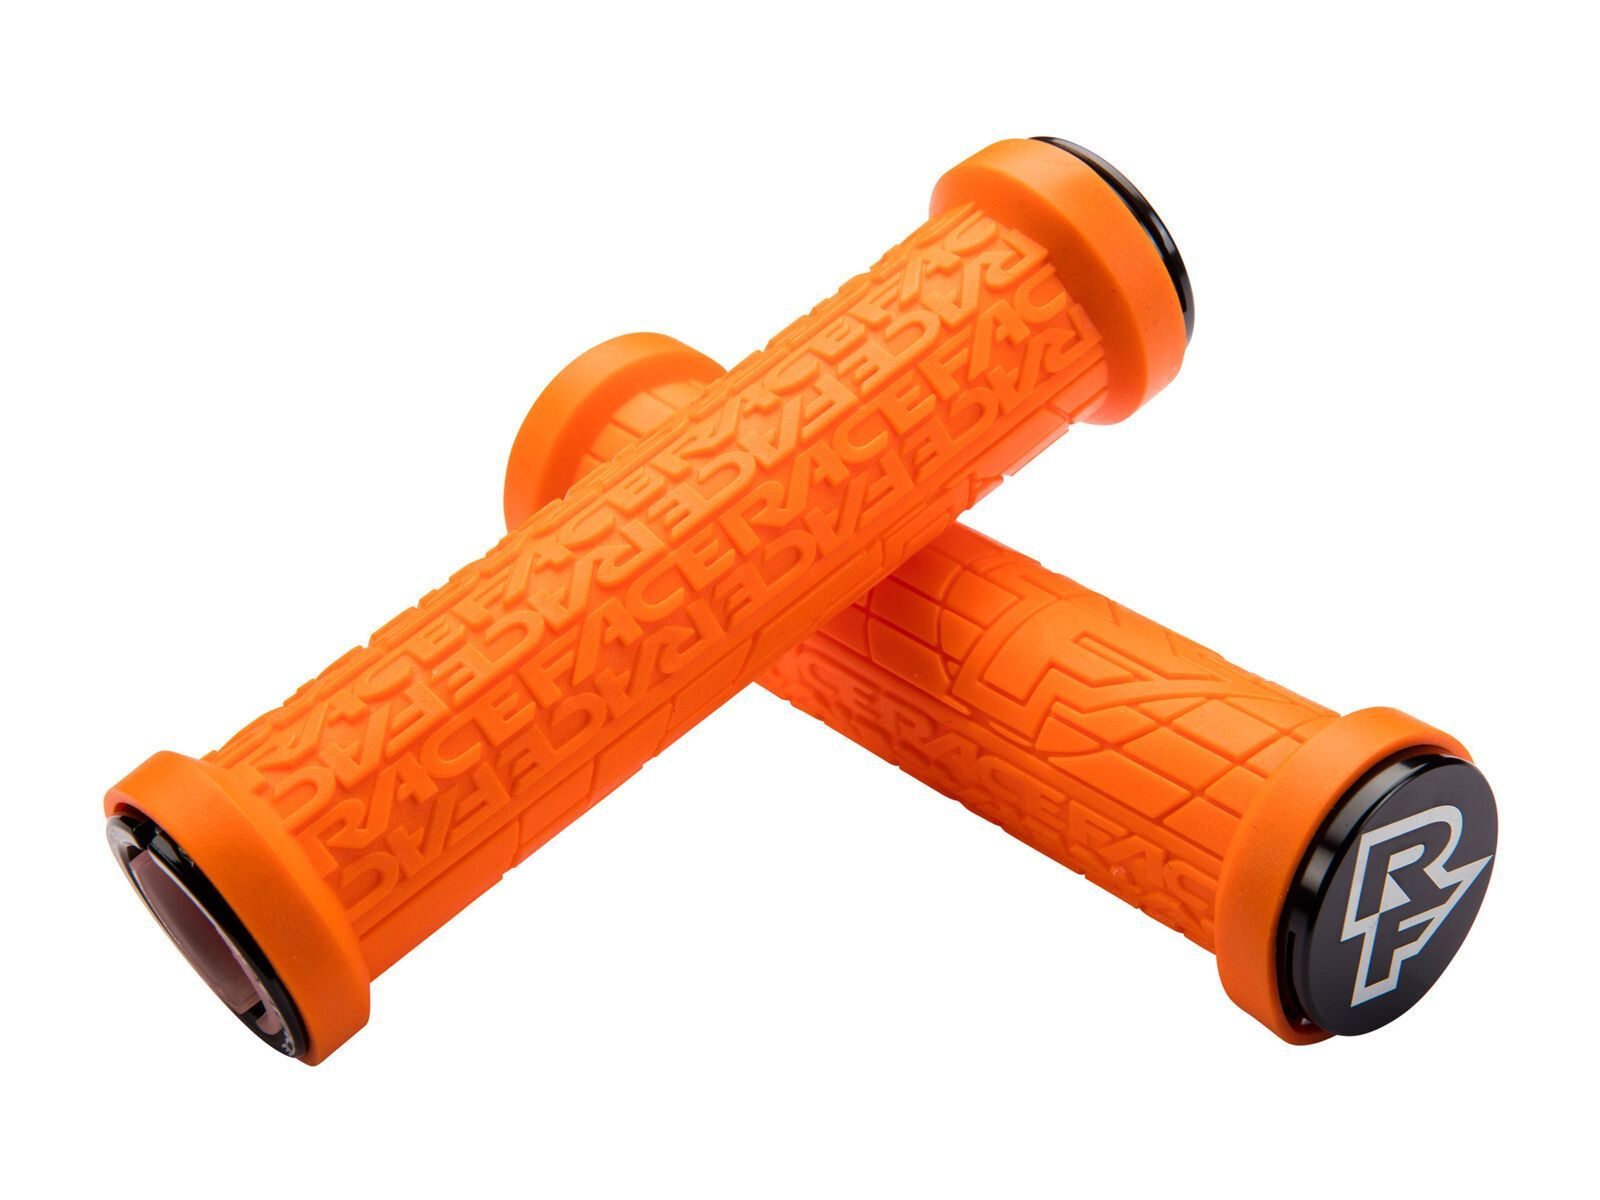 Race Face Grippler Grip - 30 mm, orange - Griffe 1973317441